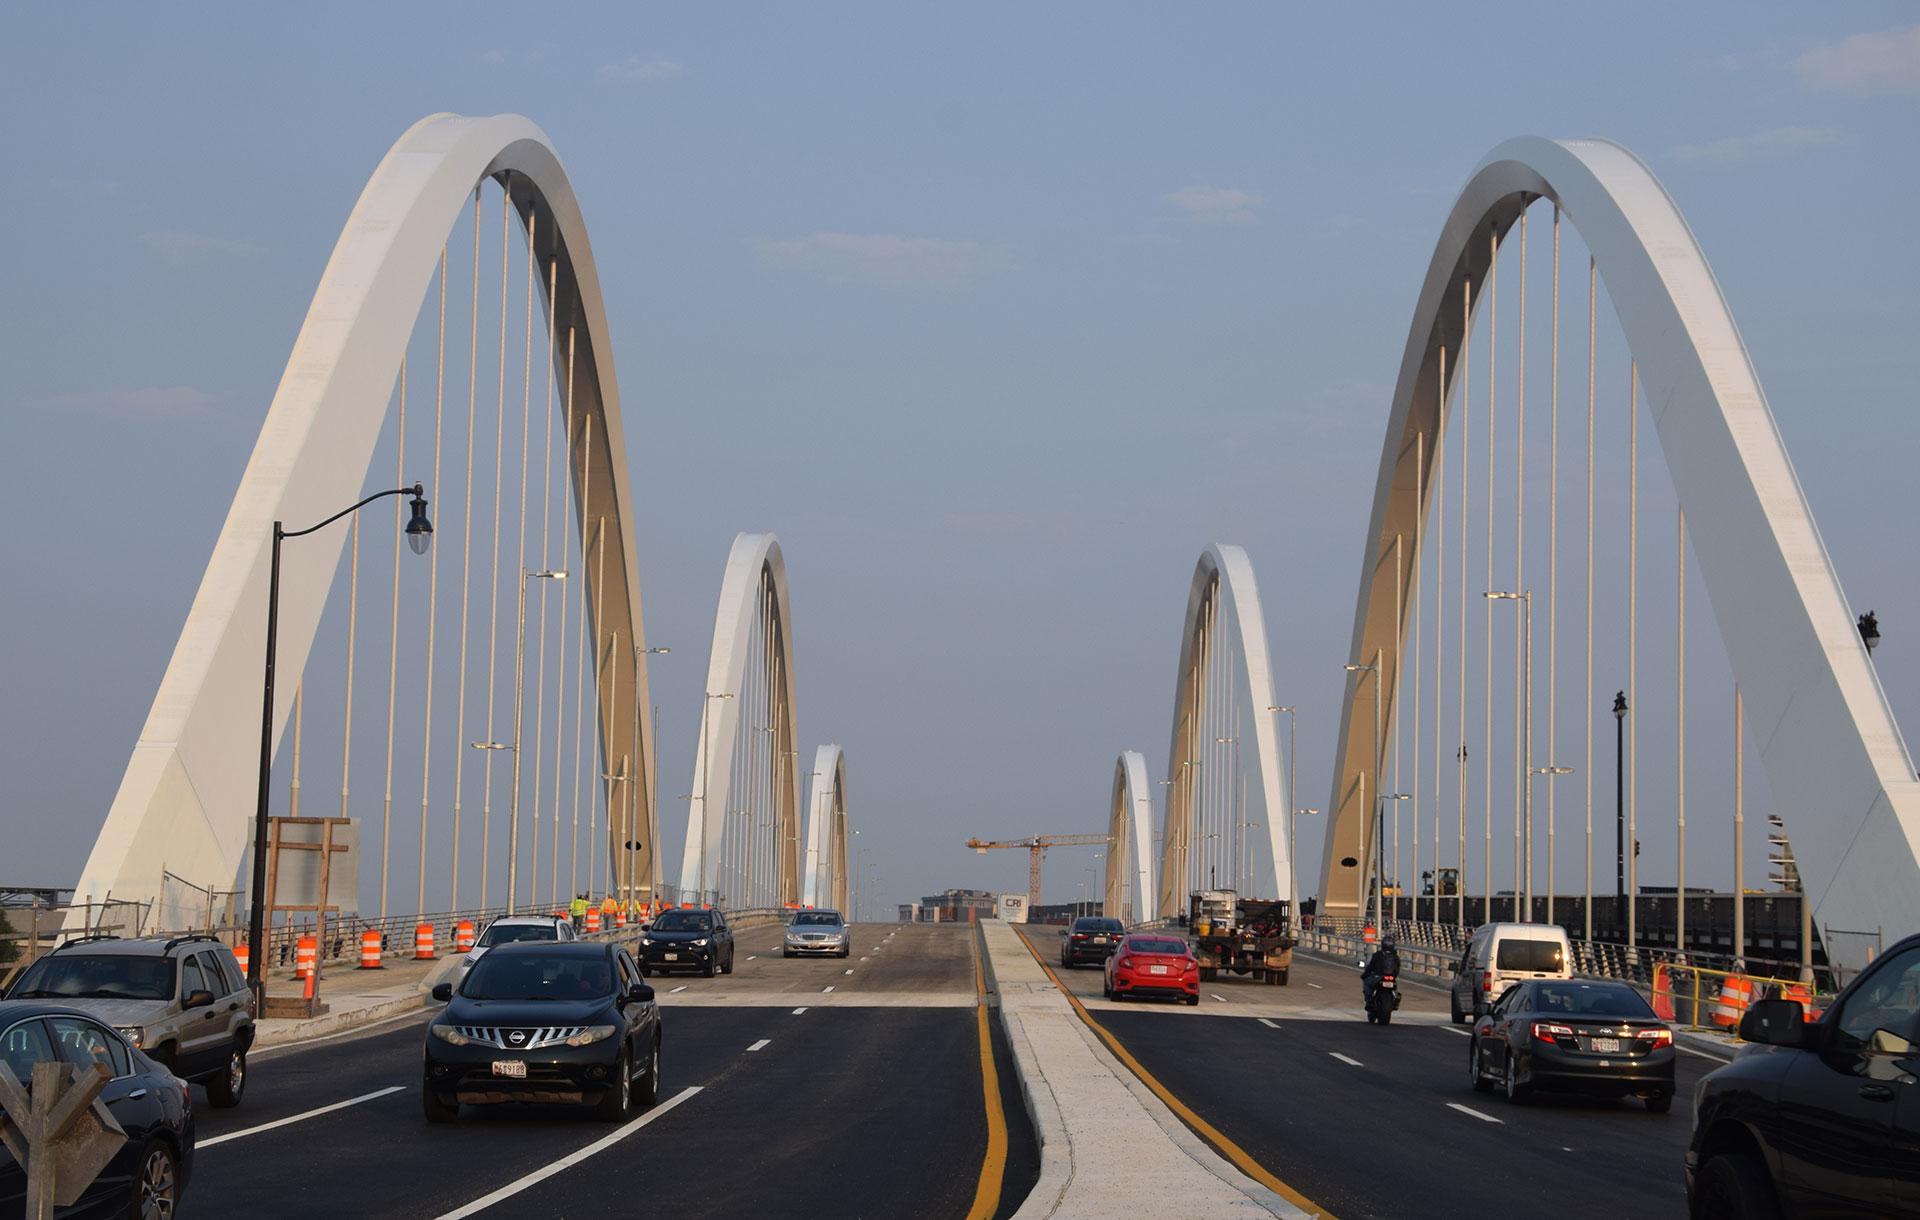 A photo of the Frederick Douglass Memorial Bridge in Washington, DC